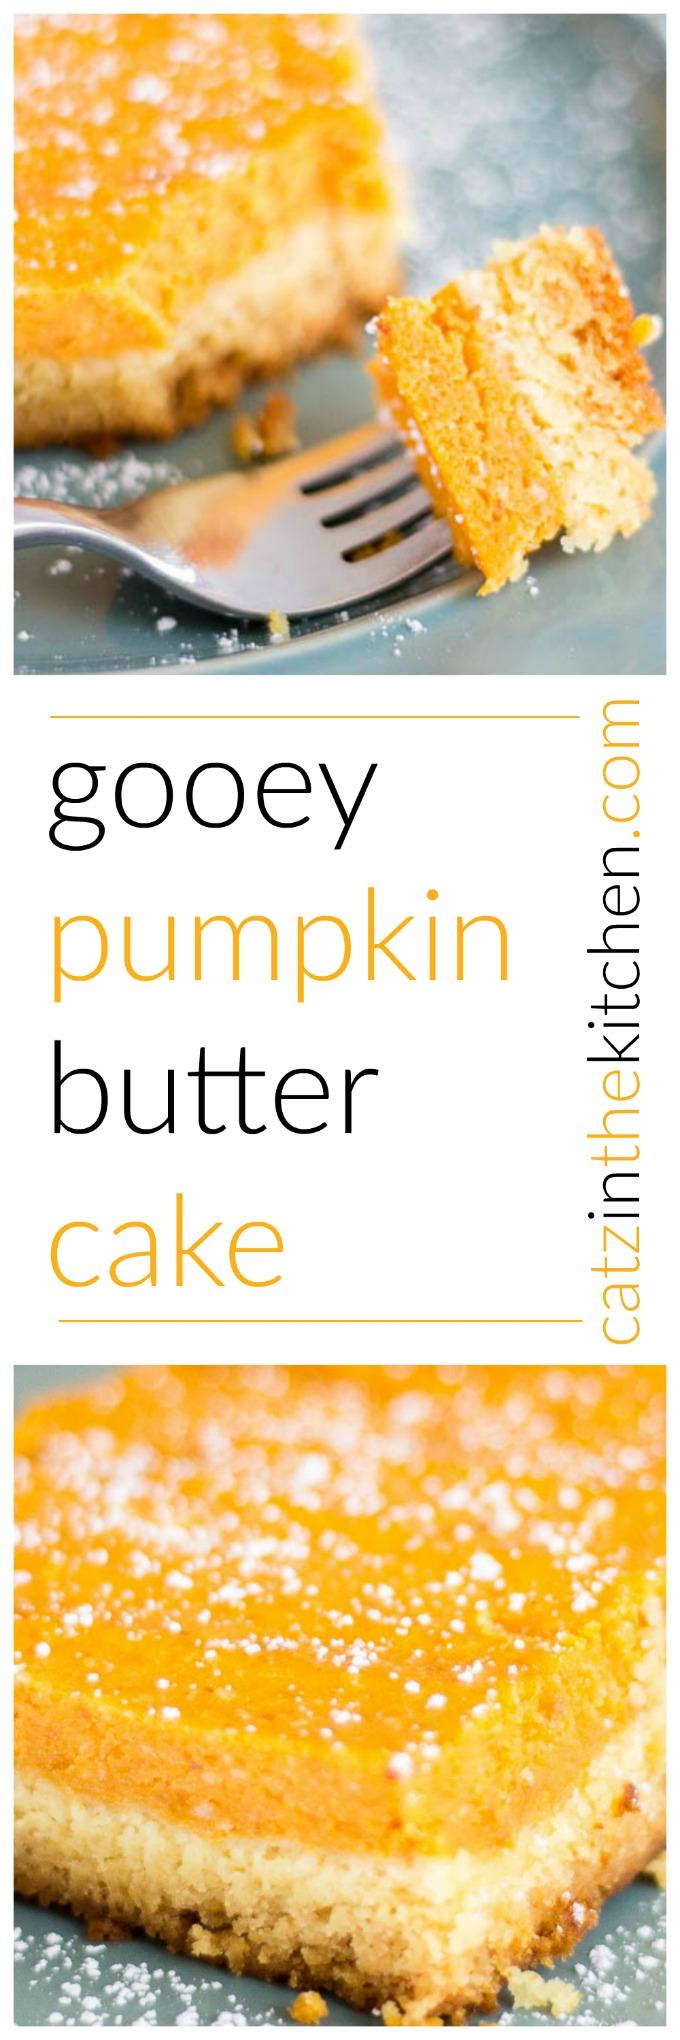 Gooey Pumpkin Butter Cake   Catz in the Kitchen   catzinthekitchen.com   #cake #recipe #pumpkin #Thanksgiving